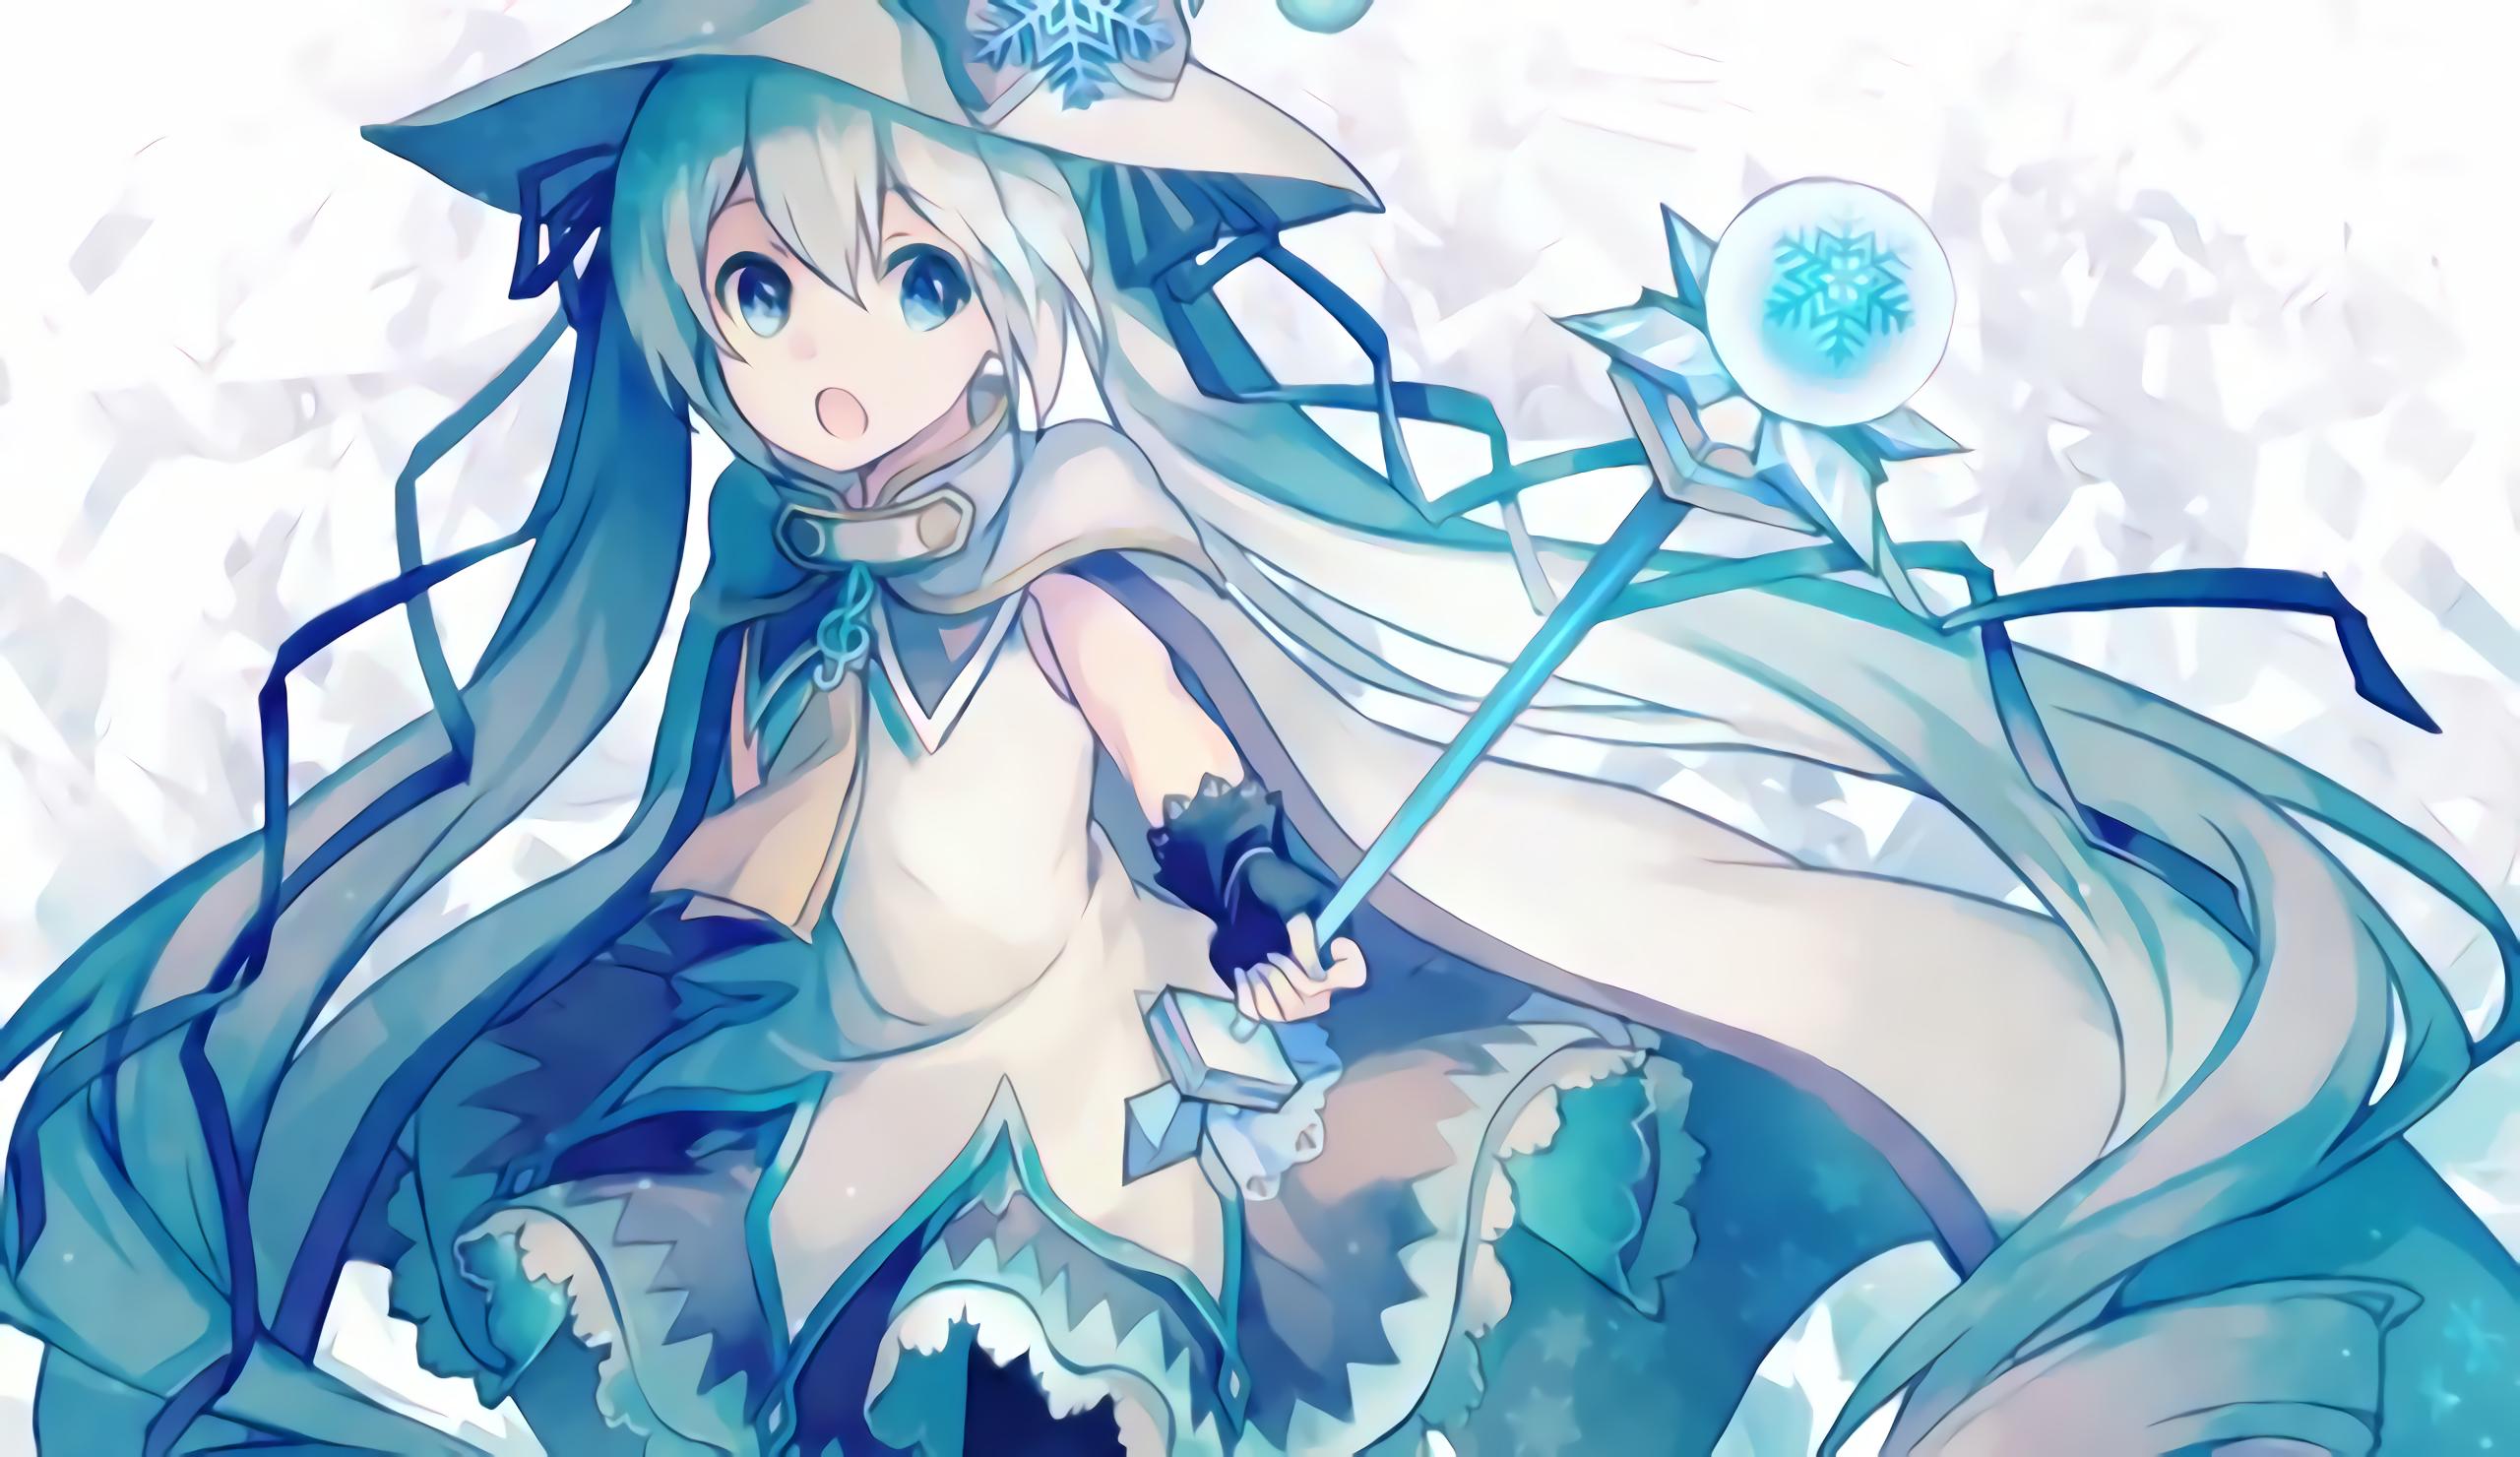 Vocaloid iphone wallpaper tumblr - Anime Vocaloid Hatsune Miku Girl Blue Hair Long Hair Wallpaper